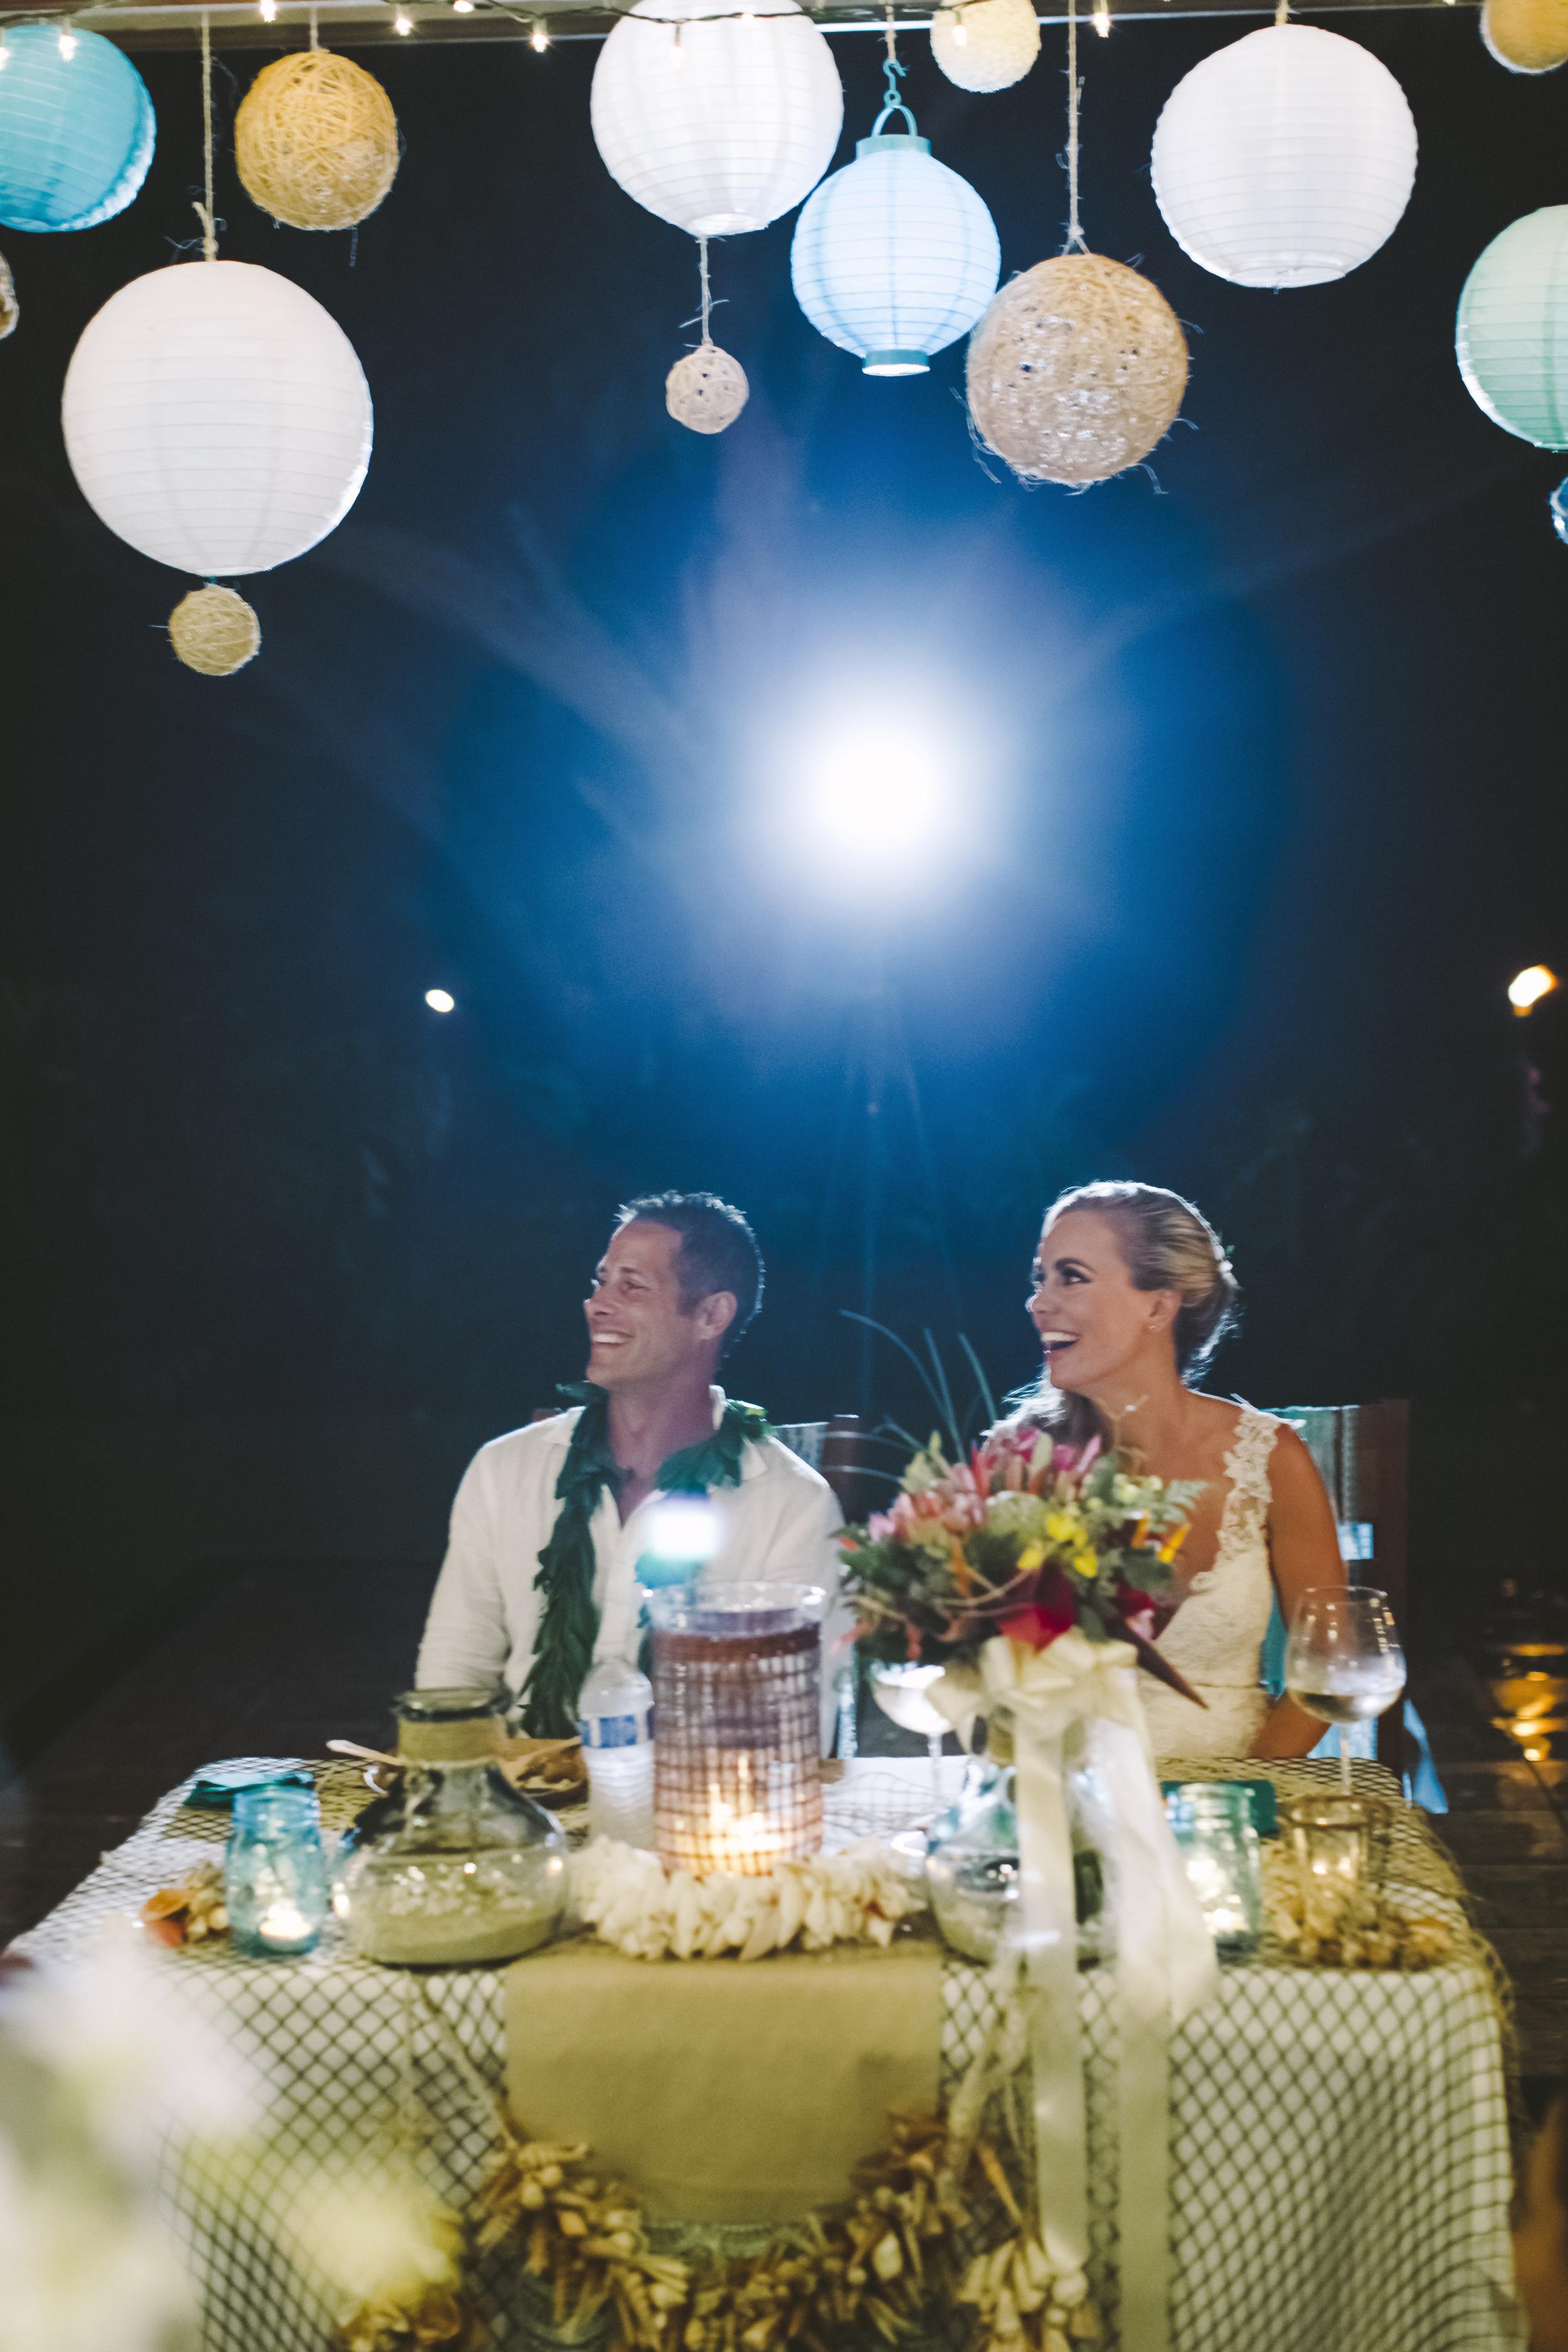 angie-diaz-photography-hawaii-wedding-photographer-kelli-jay-122.jpg